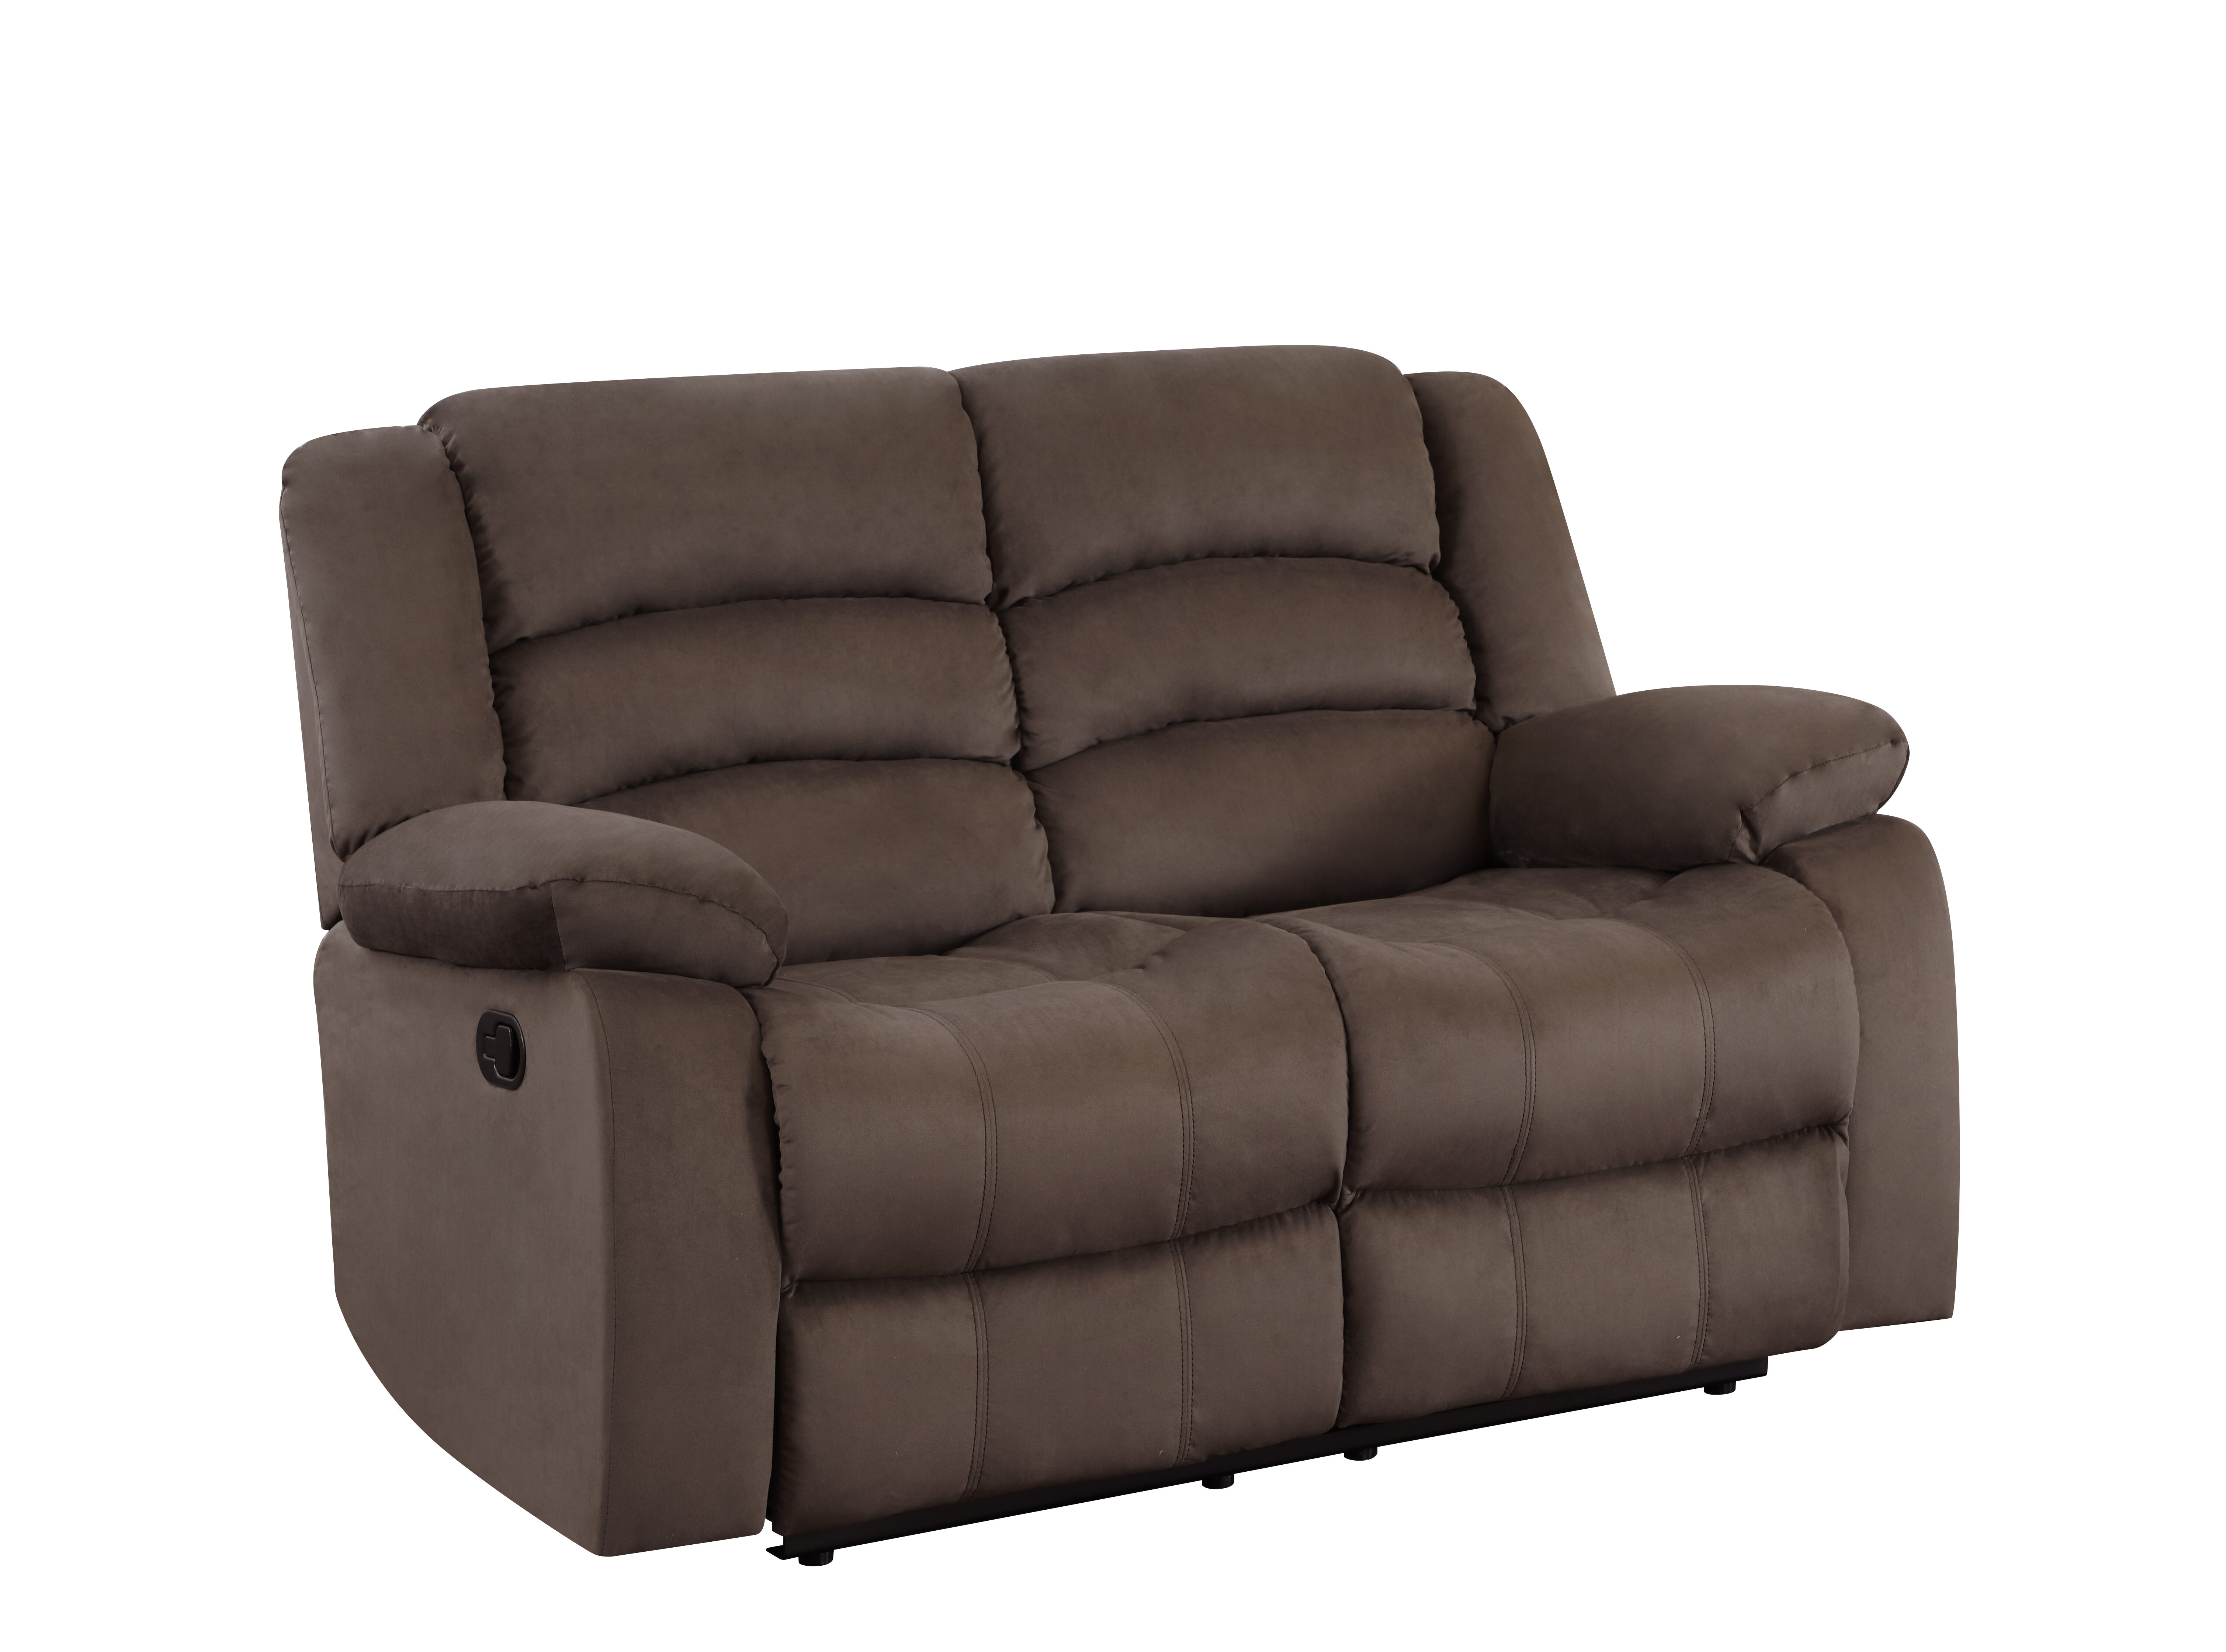 Pillow Top Arm Reclining Sofas You Ll Love In 2021 Wayfair